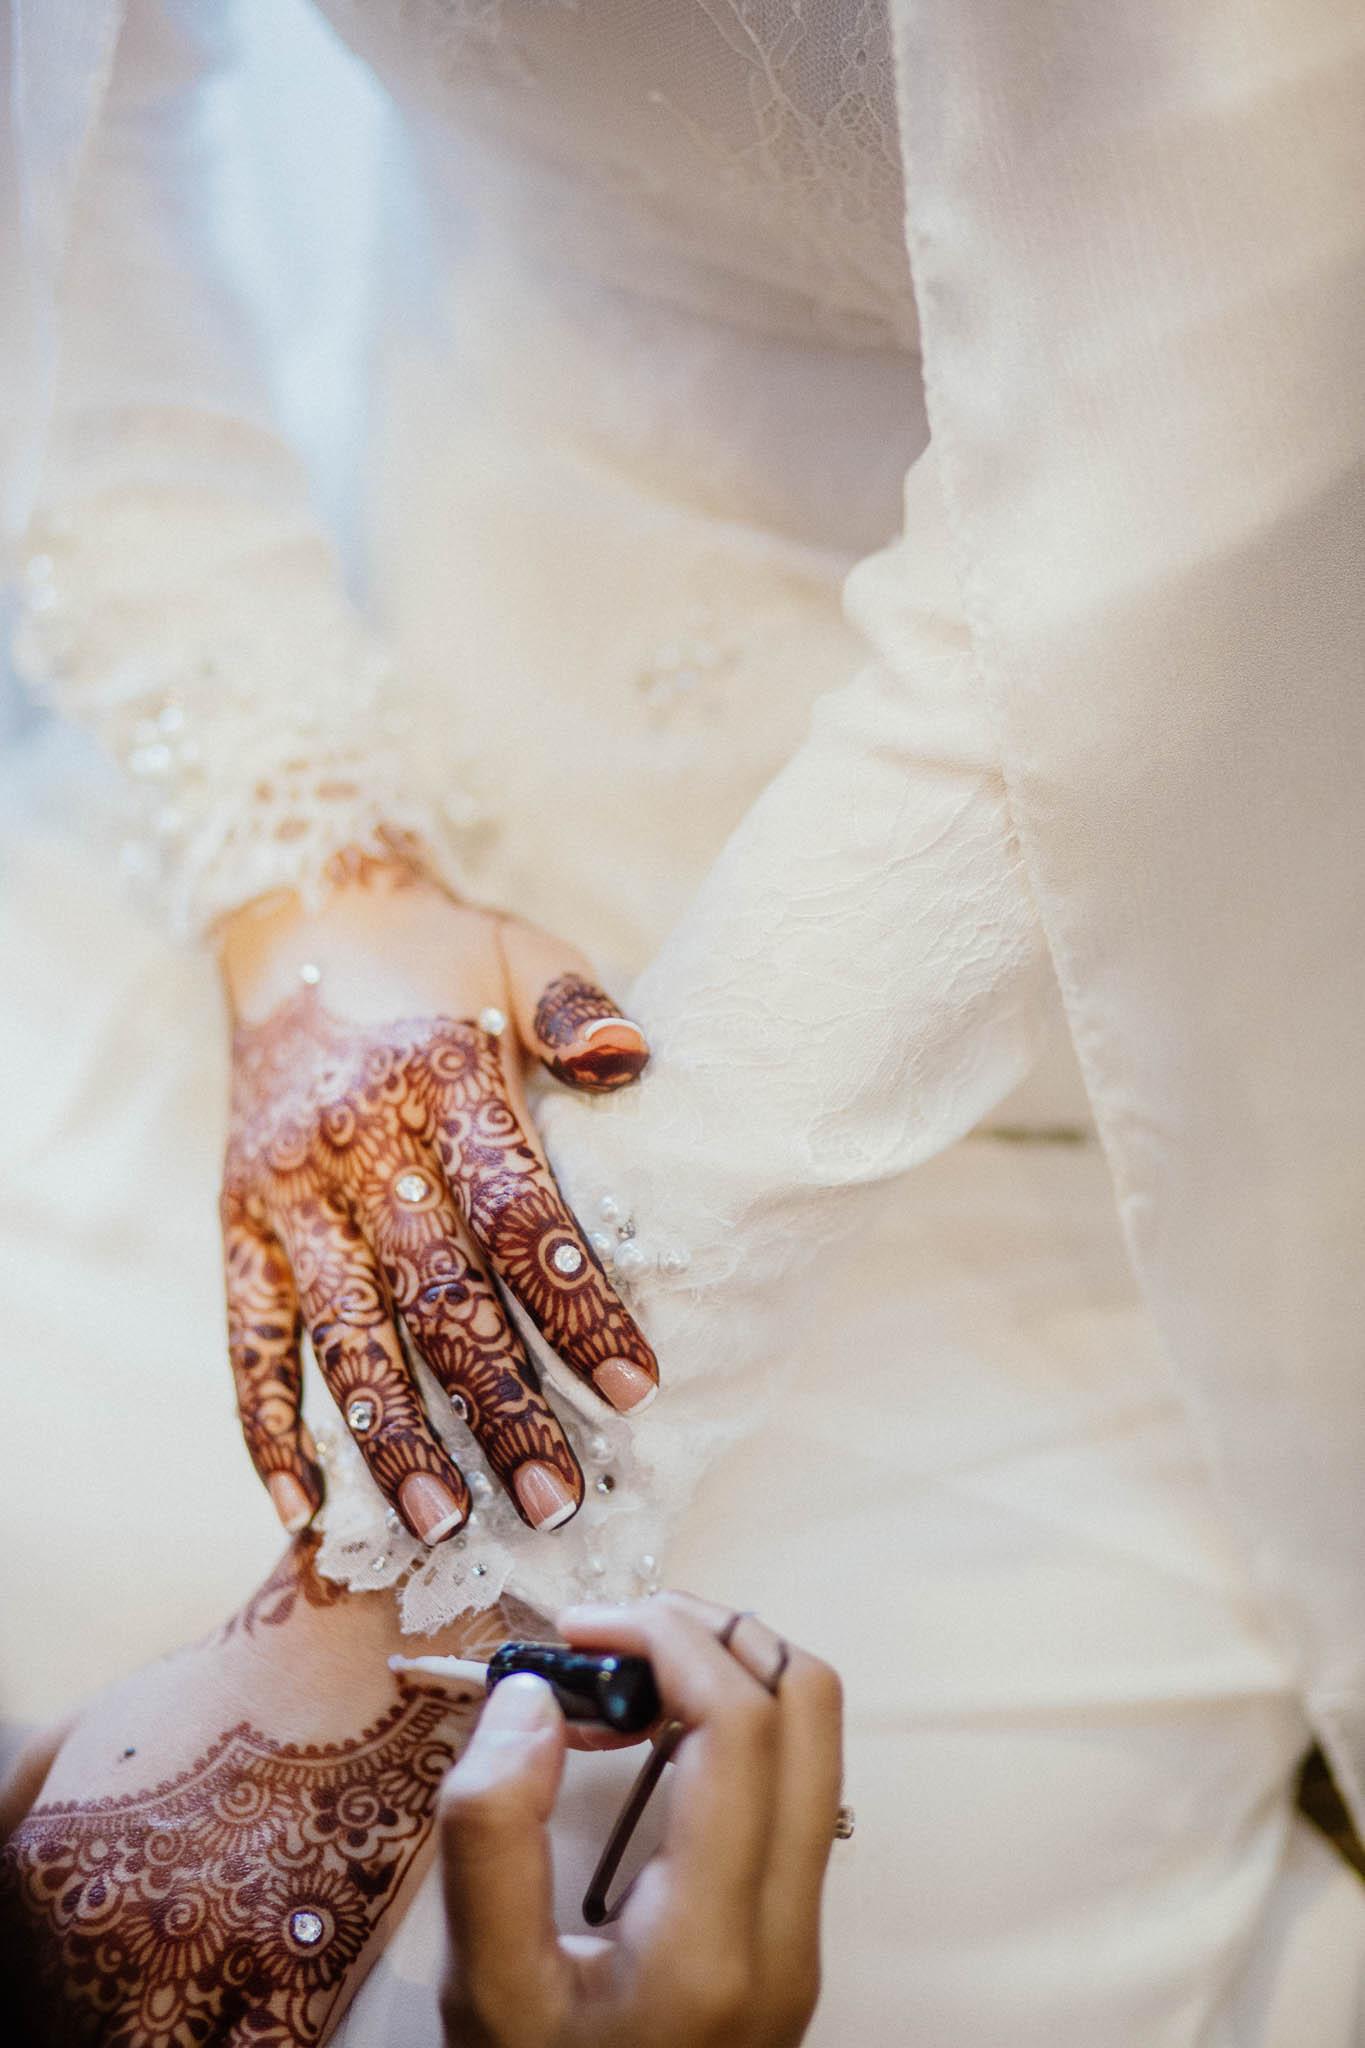 singapore-wedding-photographer-addafiq-nufail-010.jpg